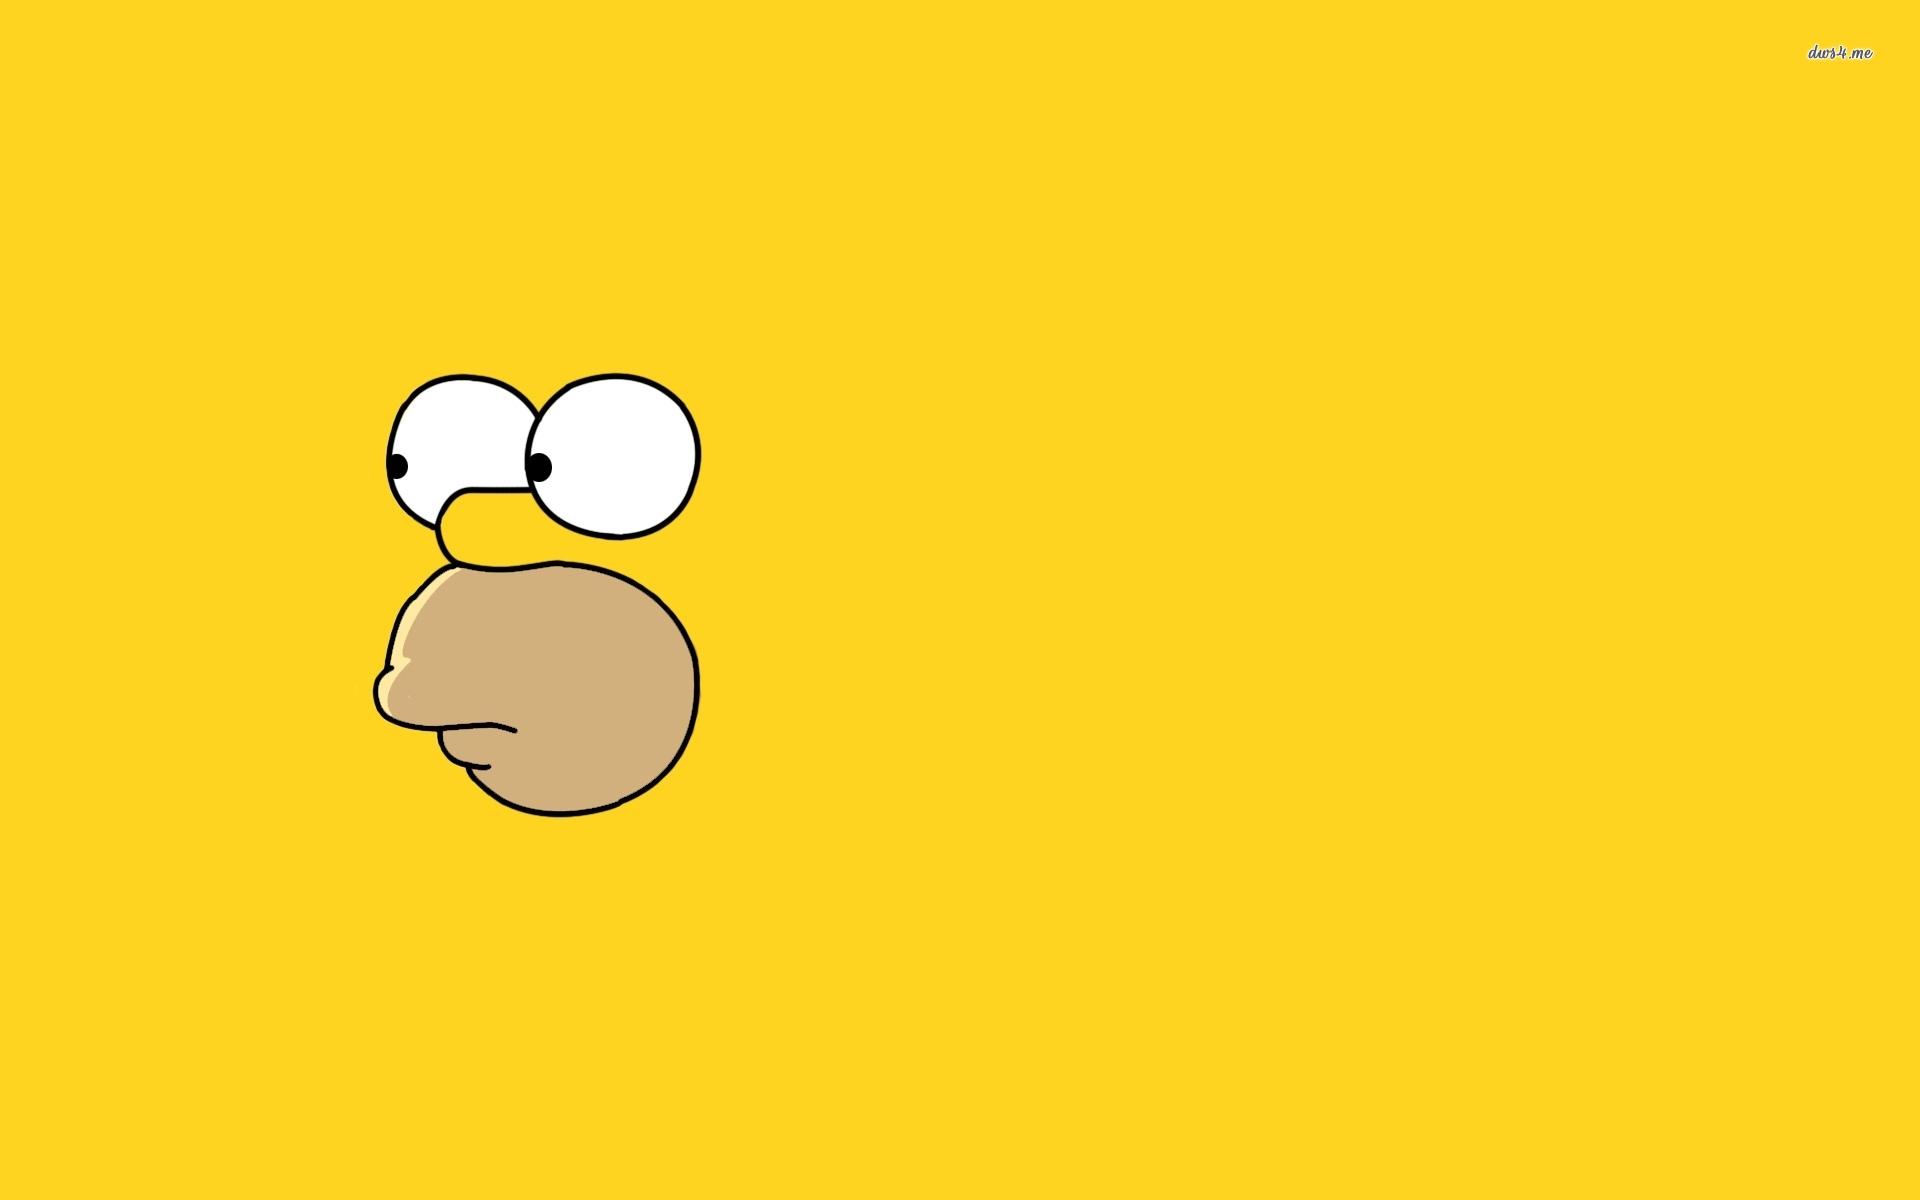 Homer Simpson wallpaper 1920x1200 61111 1920x1200